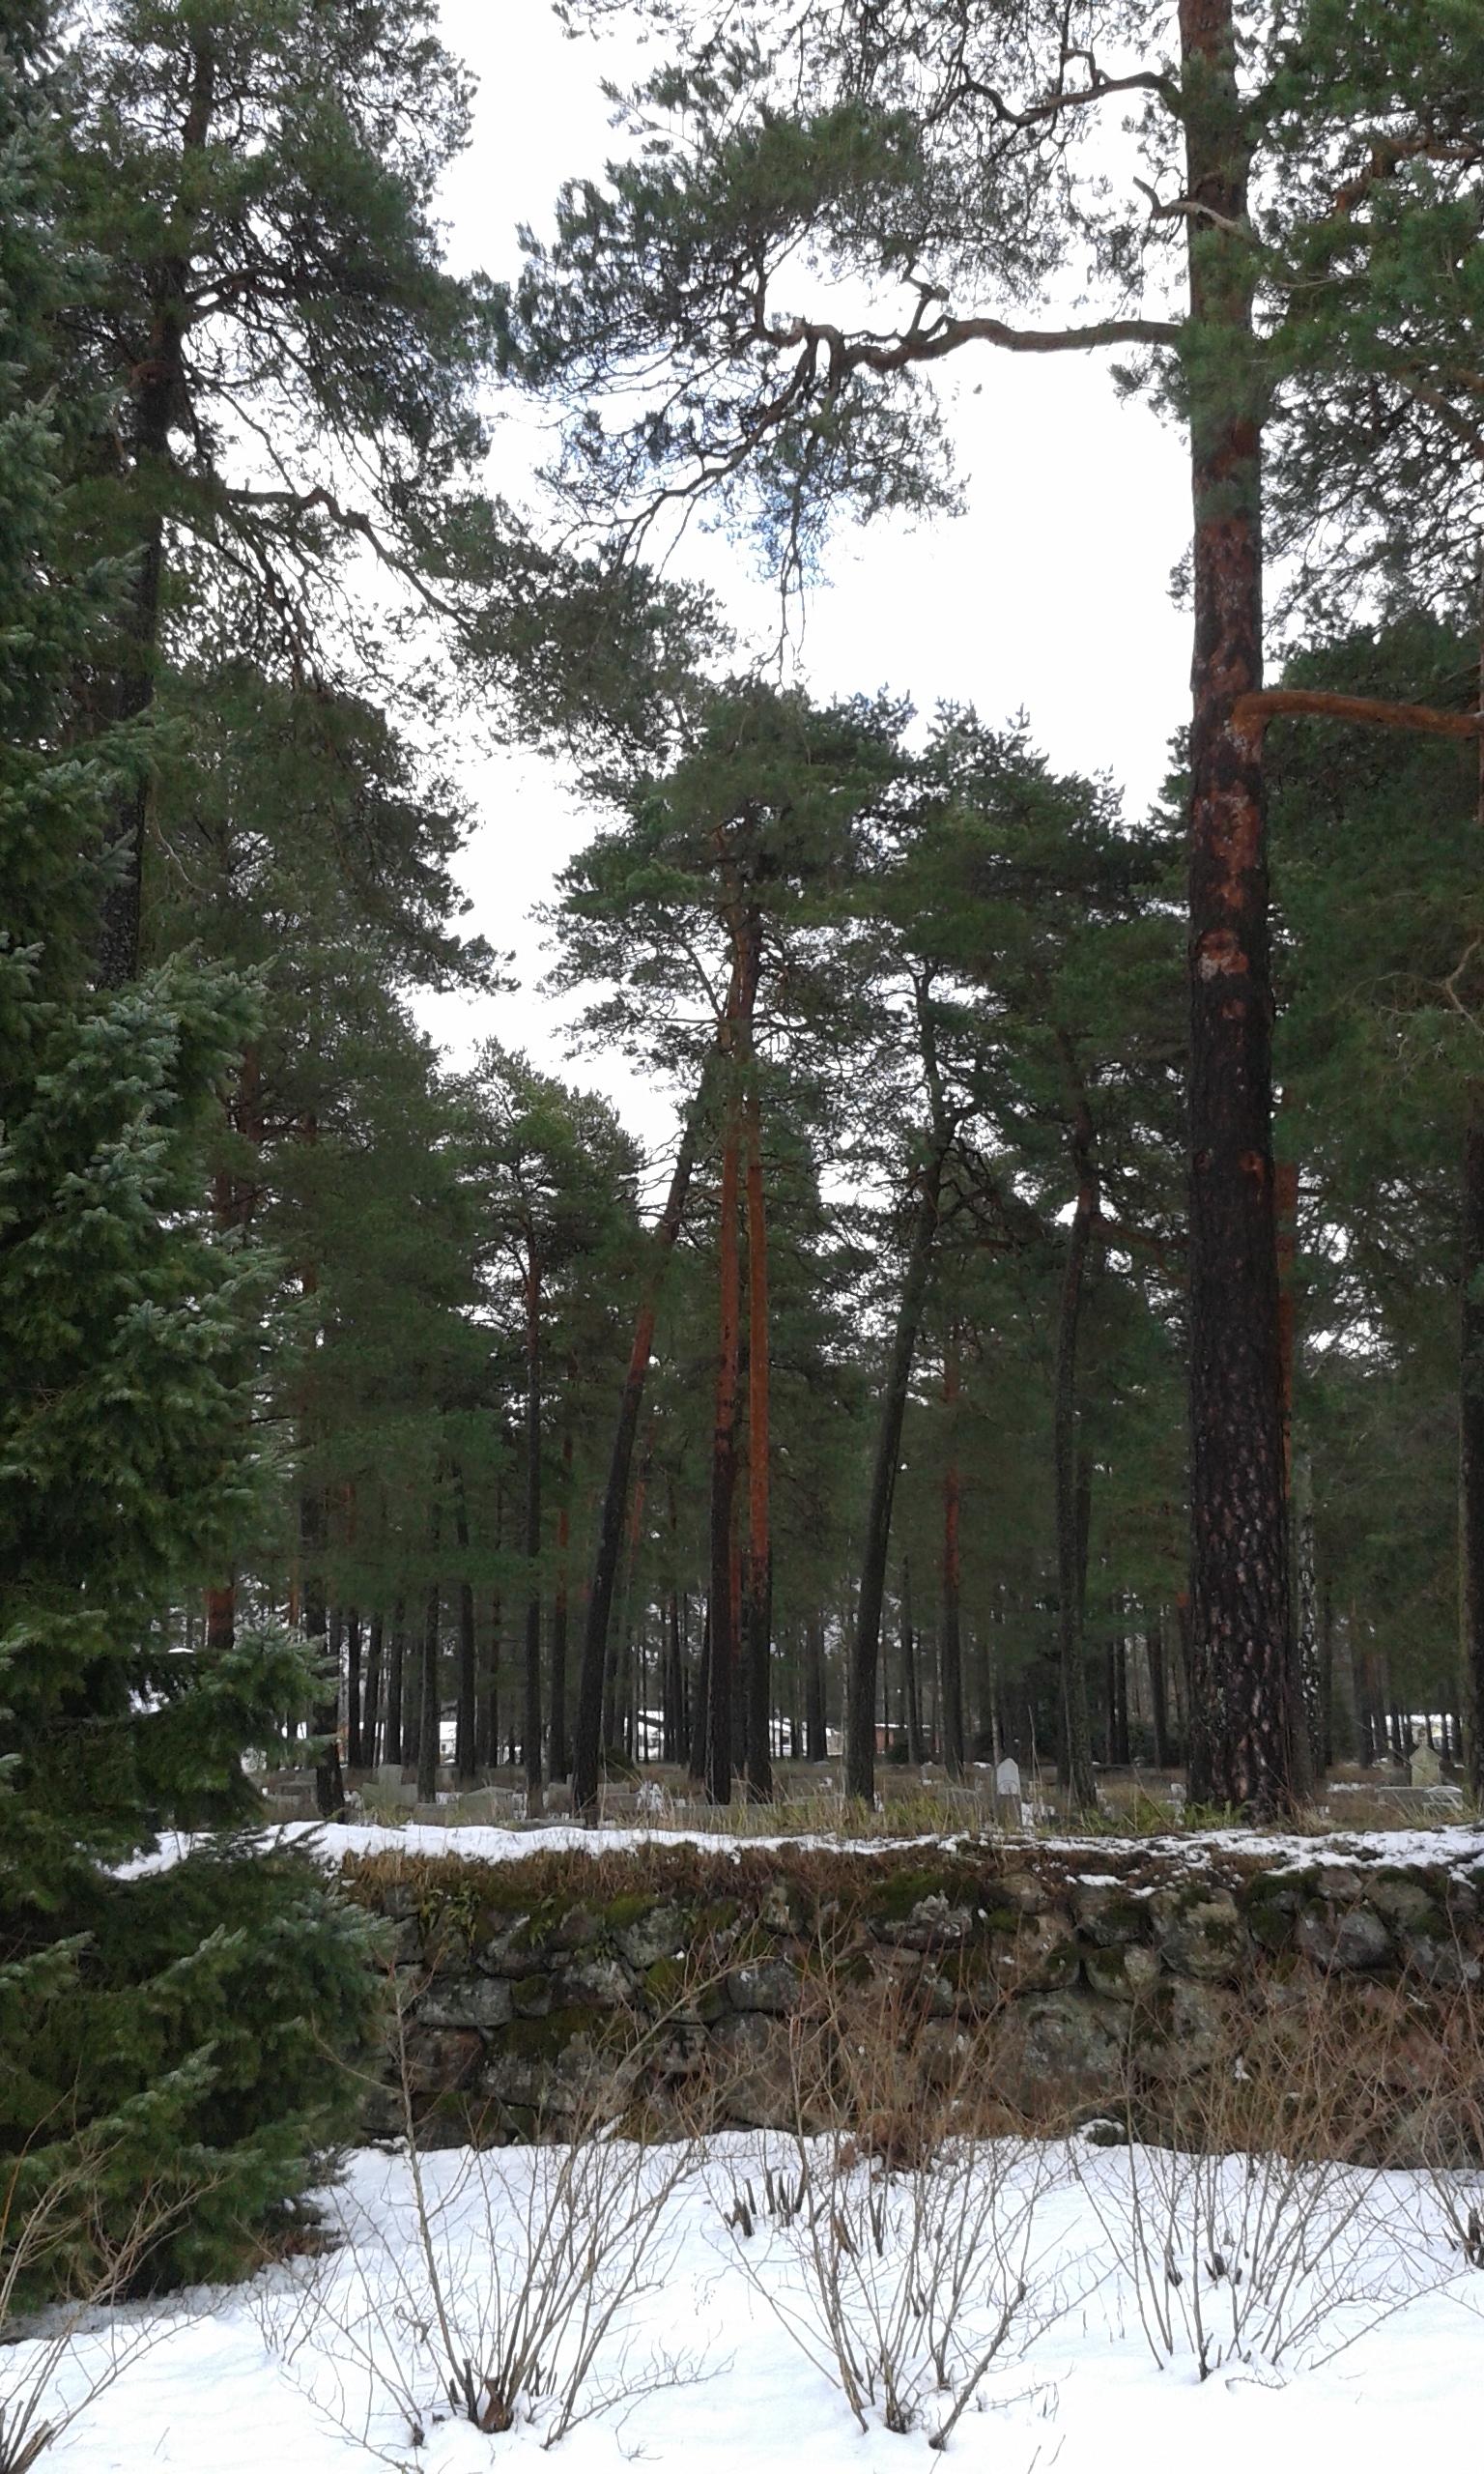 Skogskyrkogården i Skillingaryd